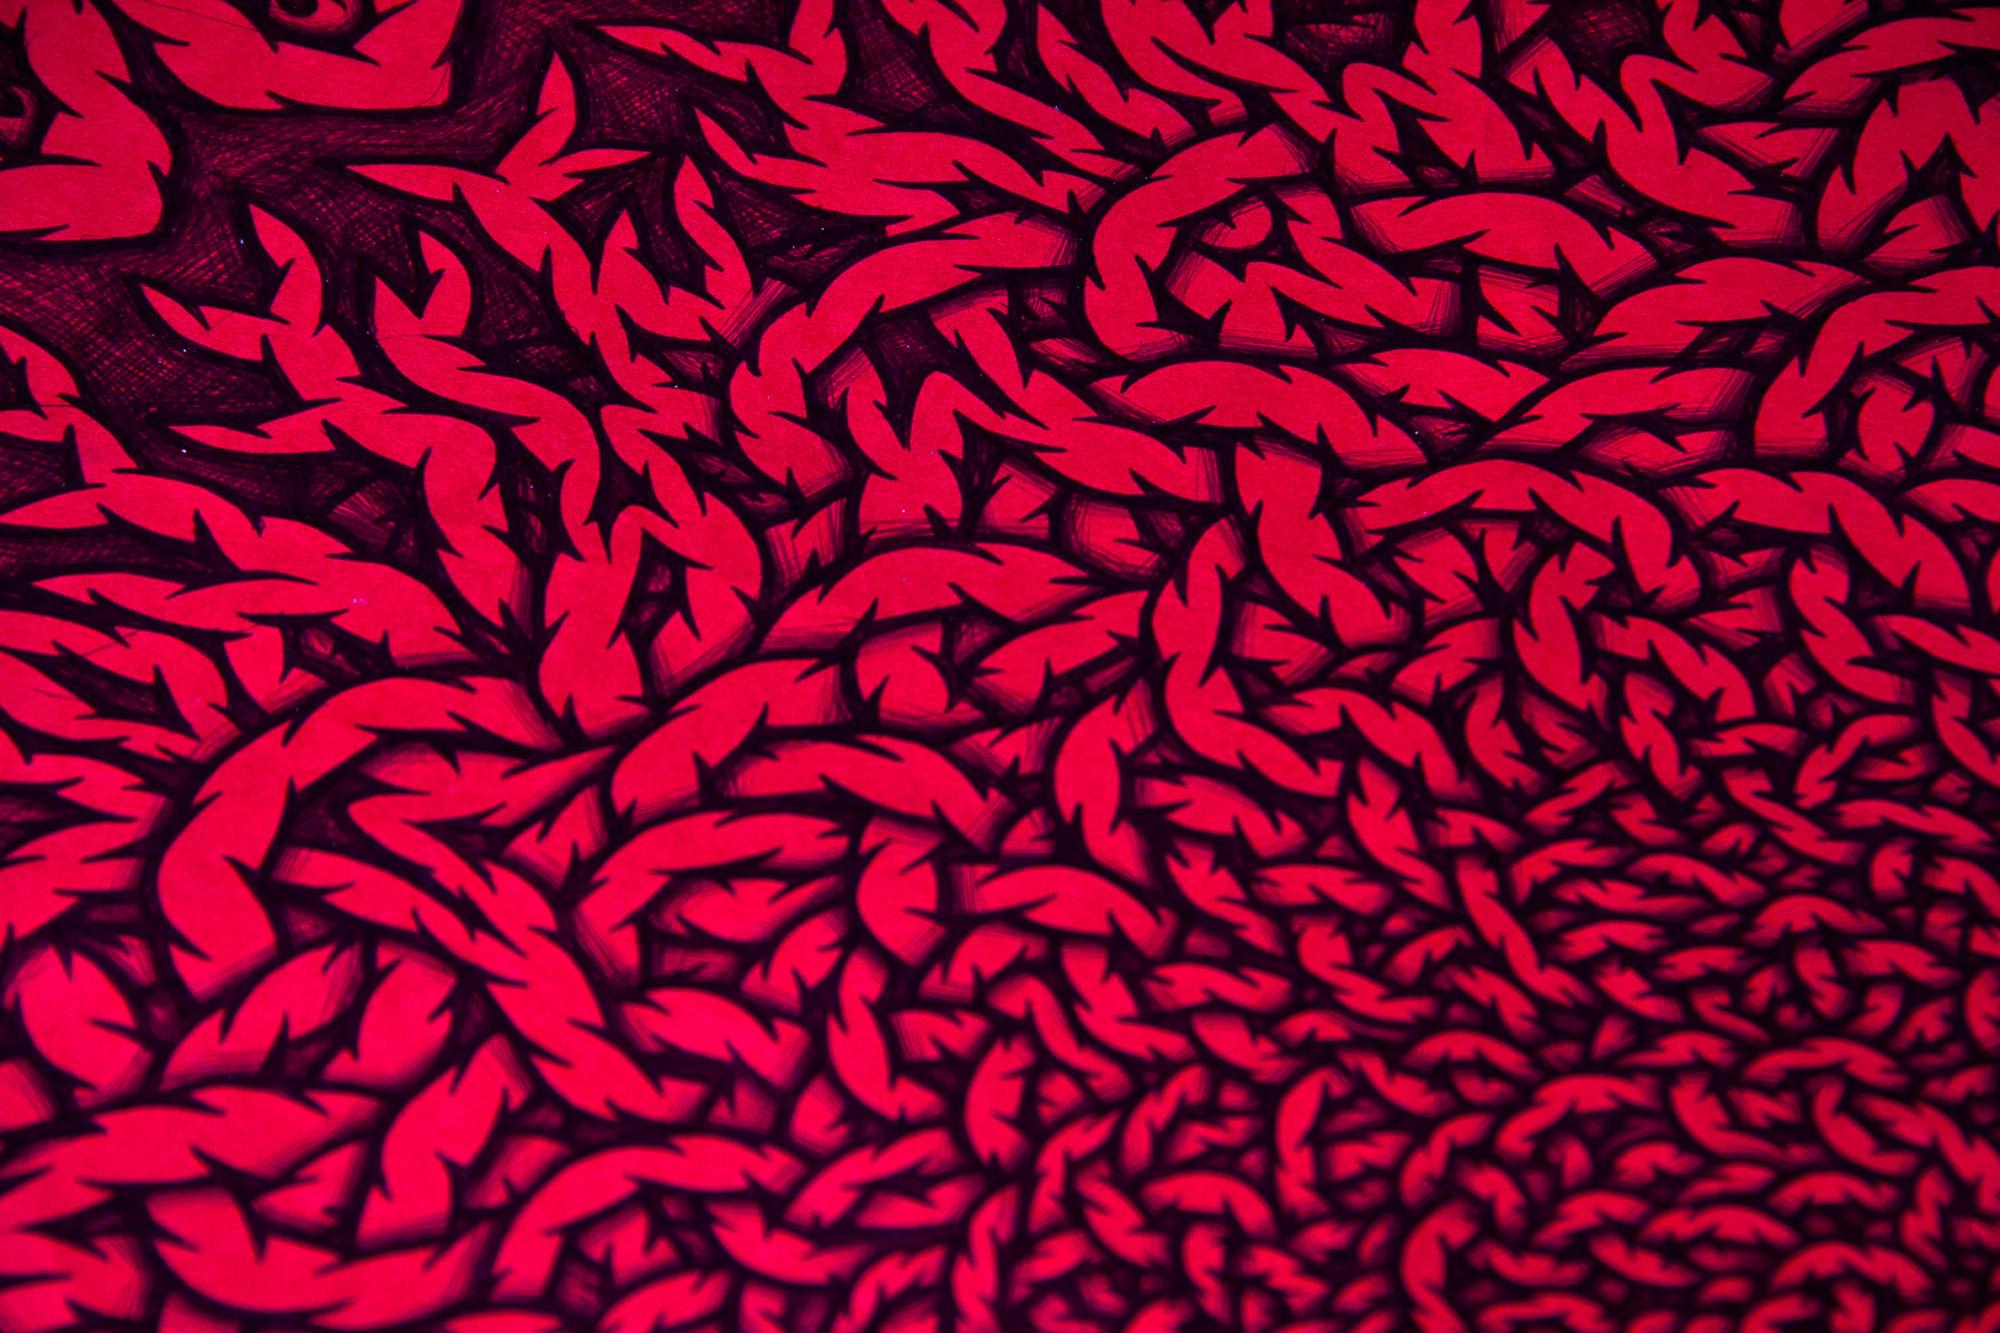 mandala-freestyle-red-dettaglio